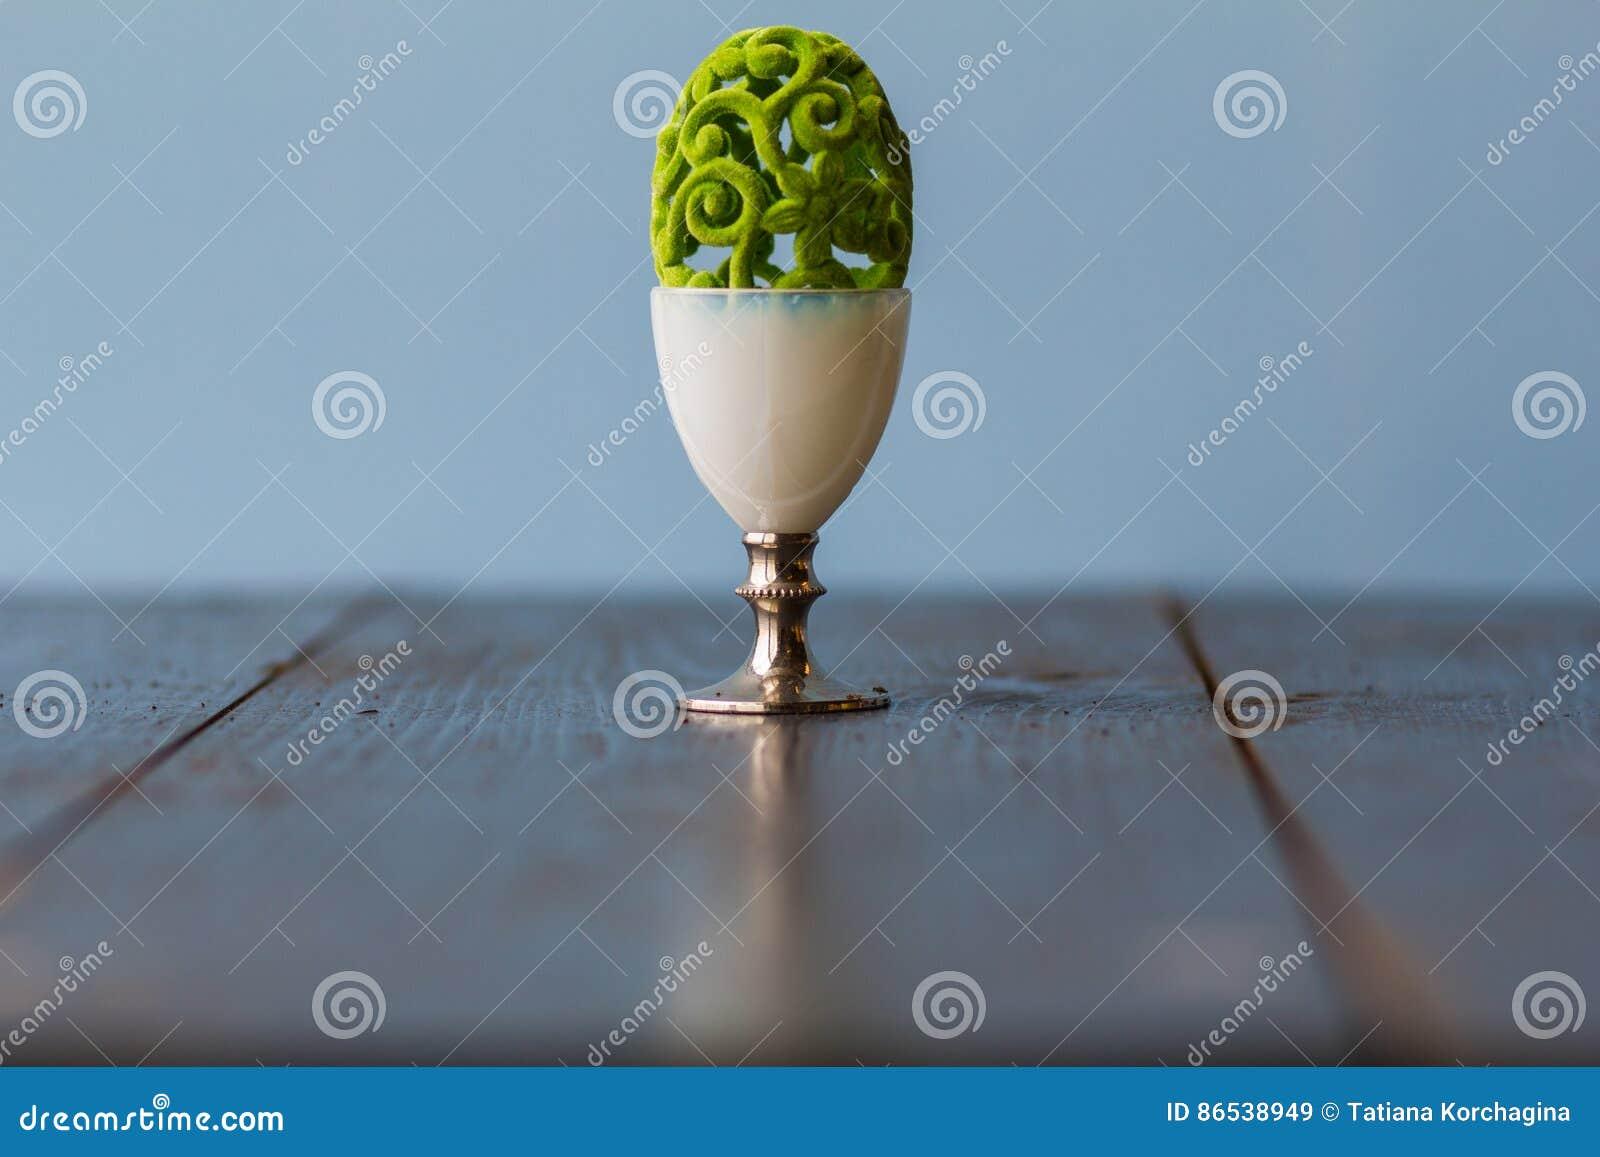 Bizarre delicate Easter decorative openwork egg in a special egg